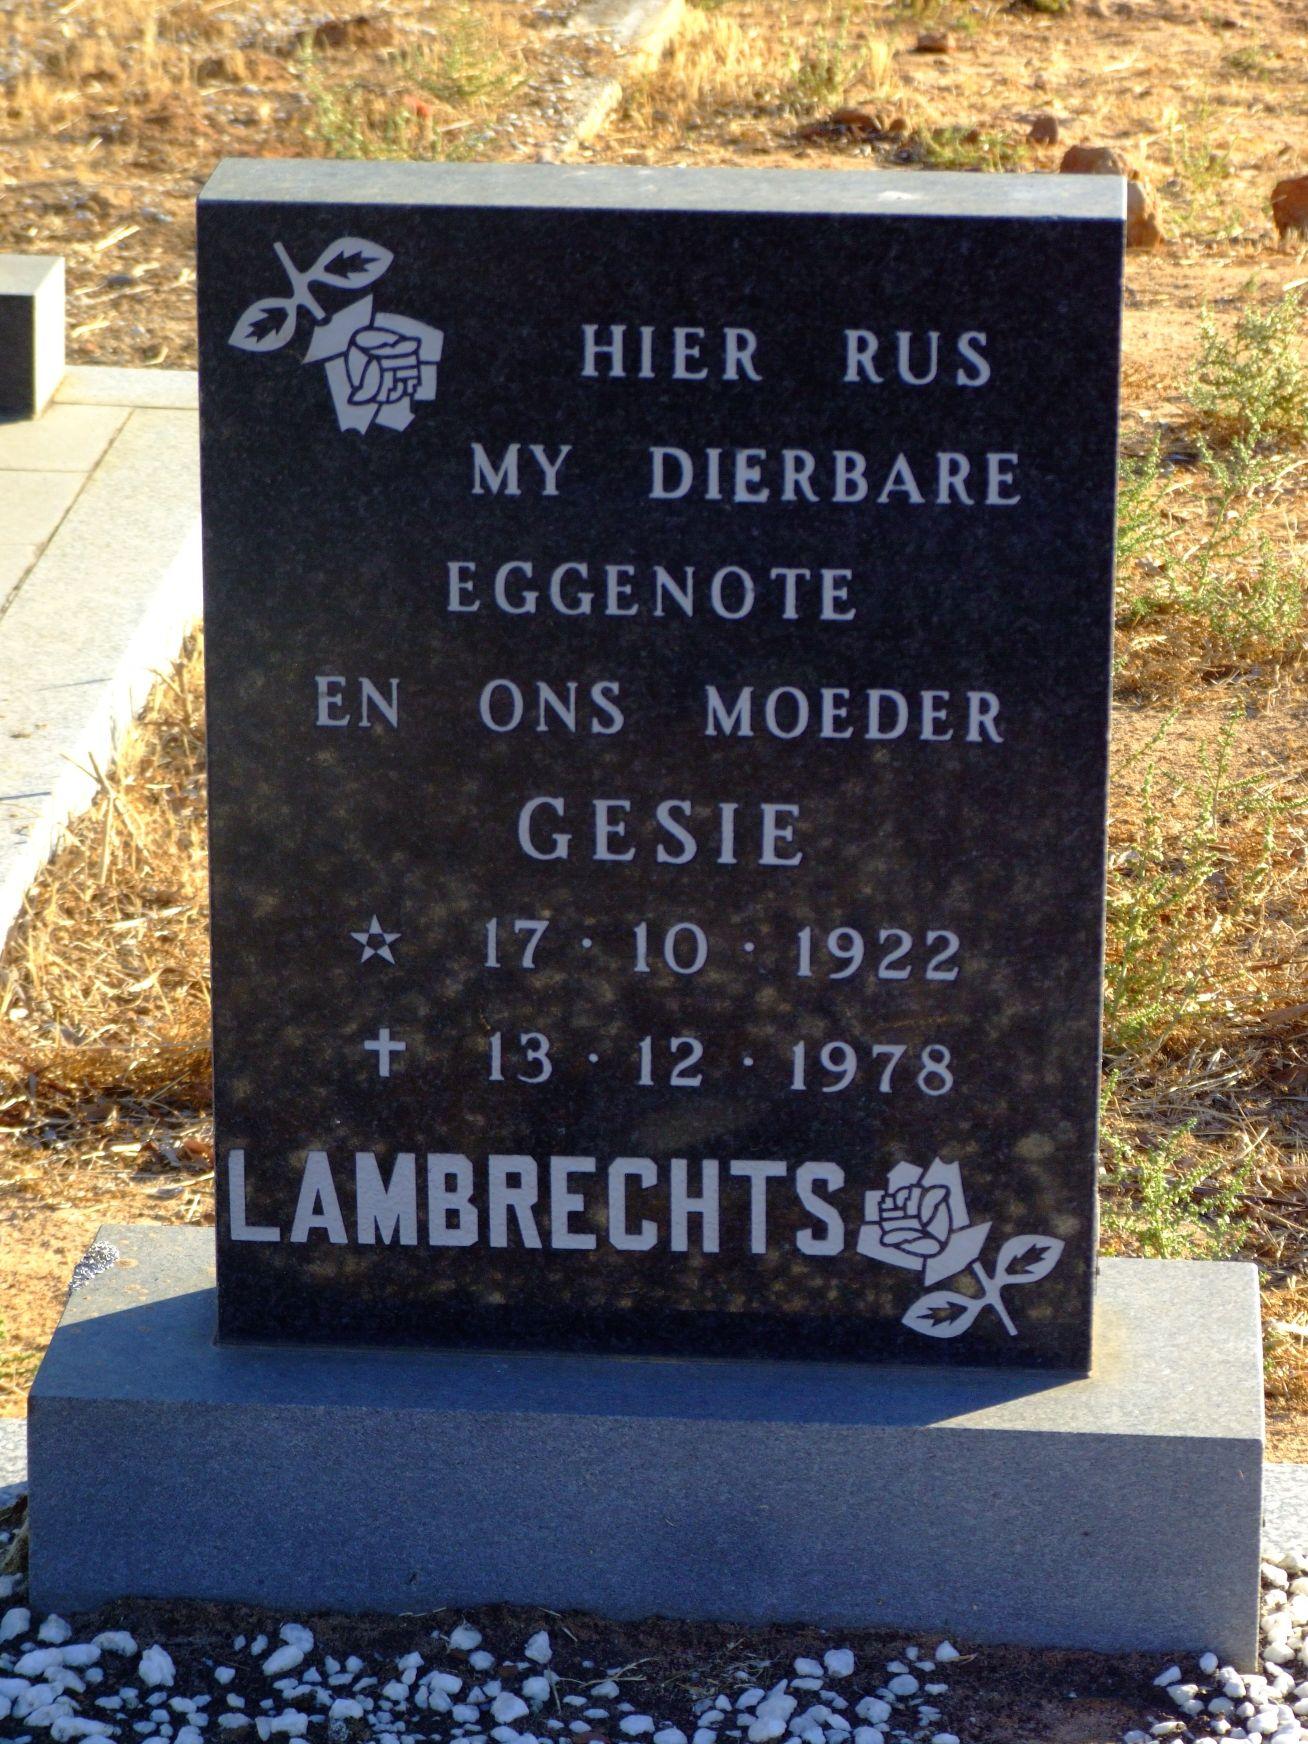 Lambrechts, Gesie